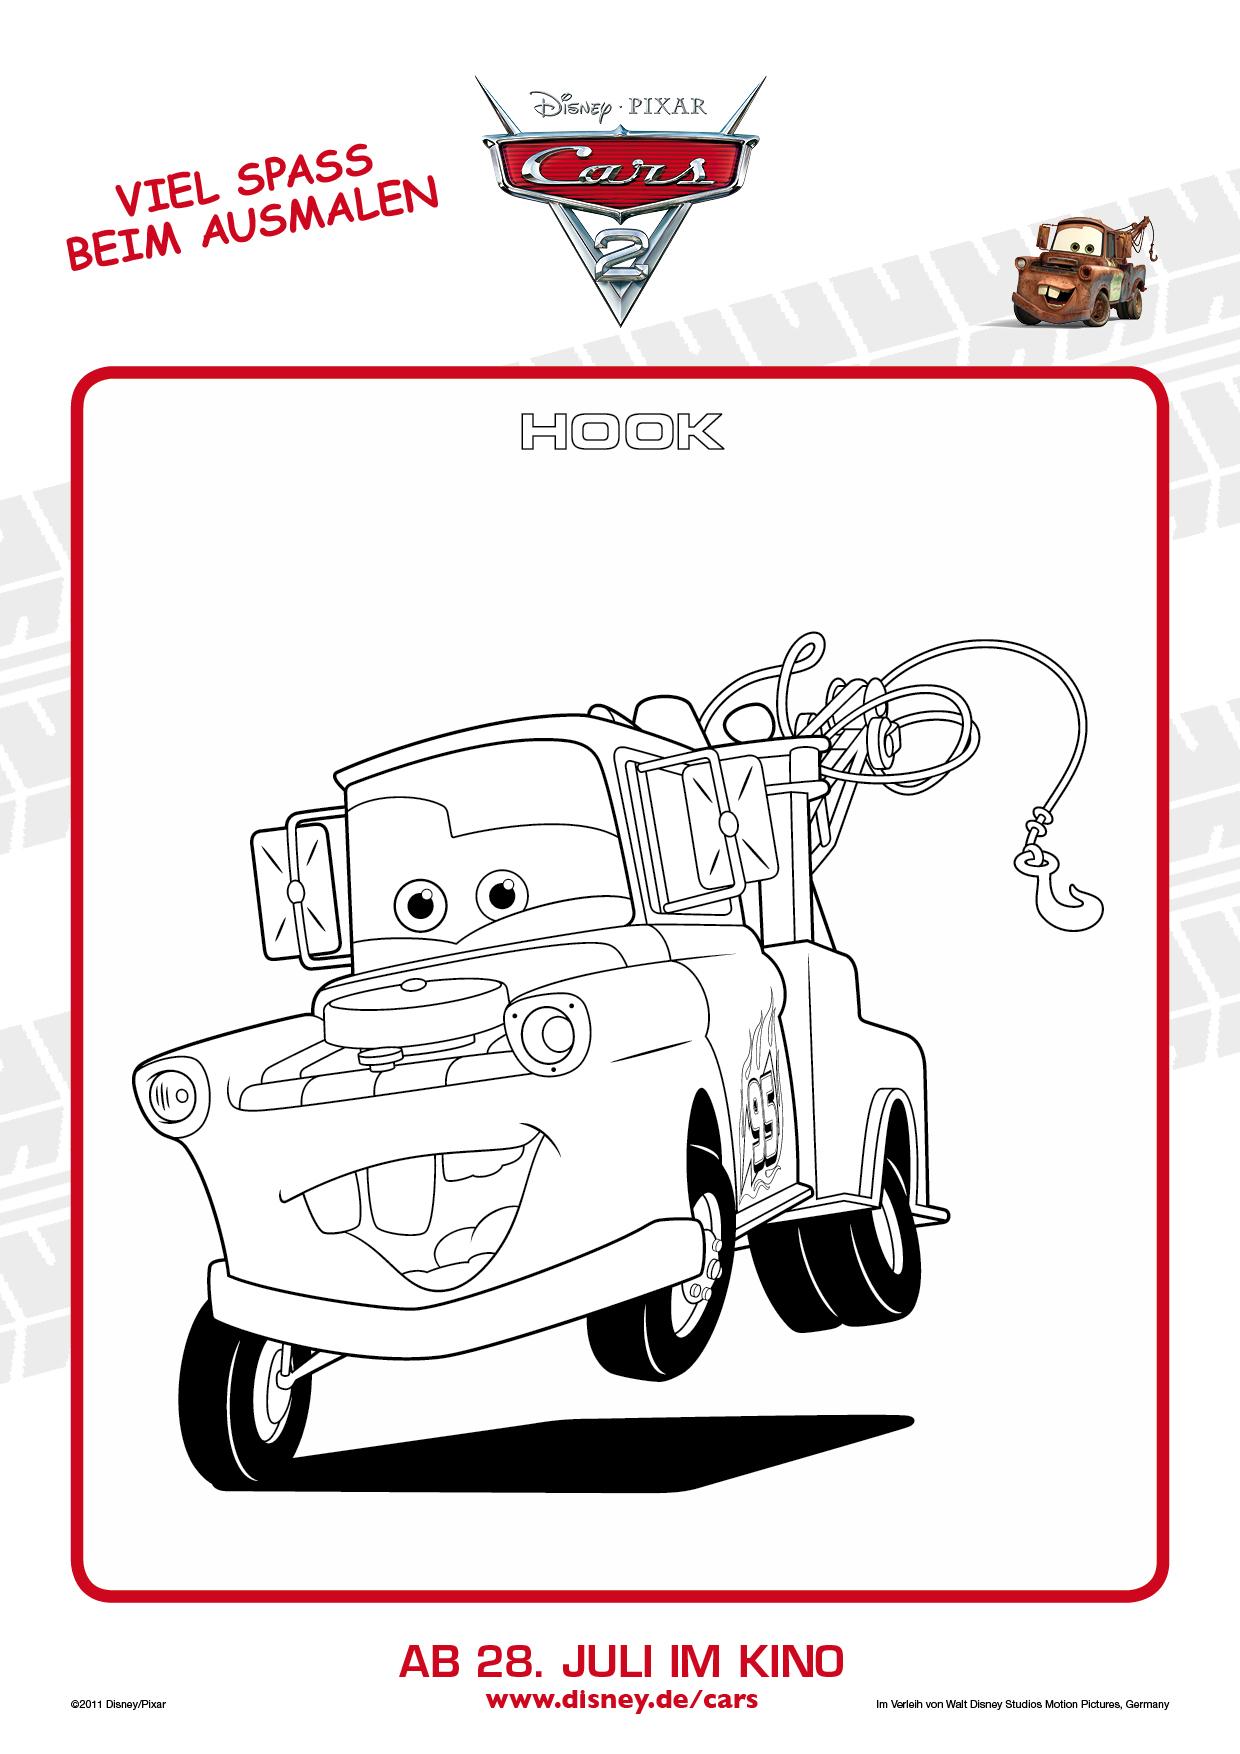 Cars im TV & Malvorlagen! Filmreihen Archiv TVButlerat